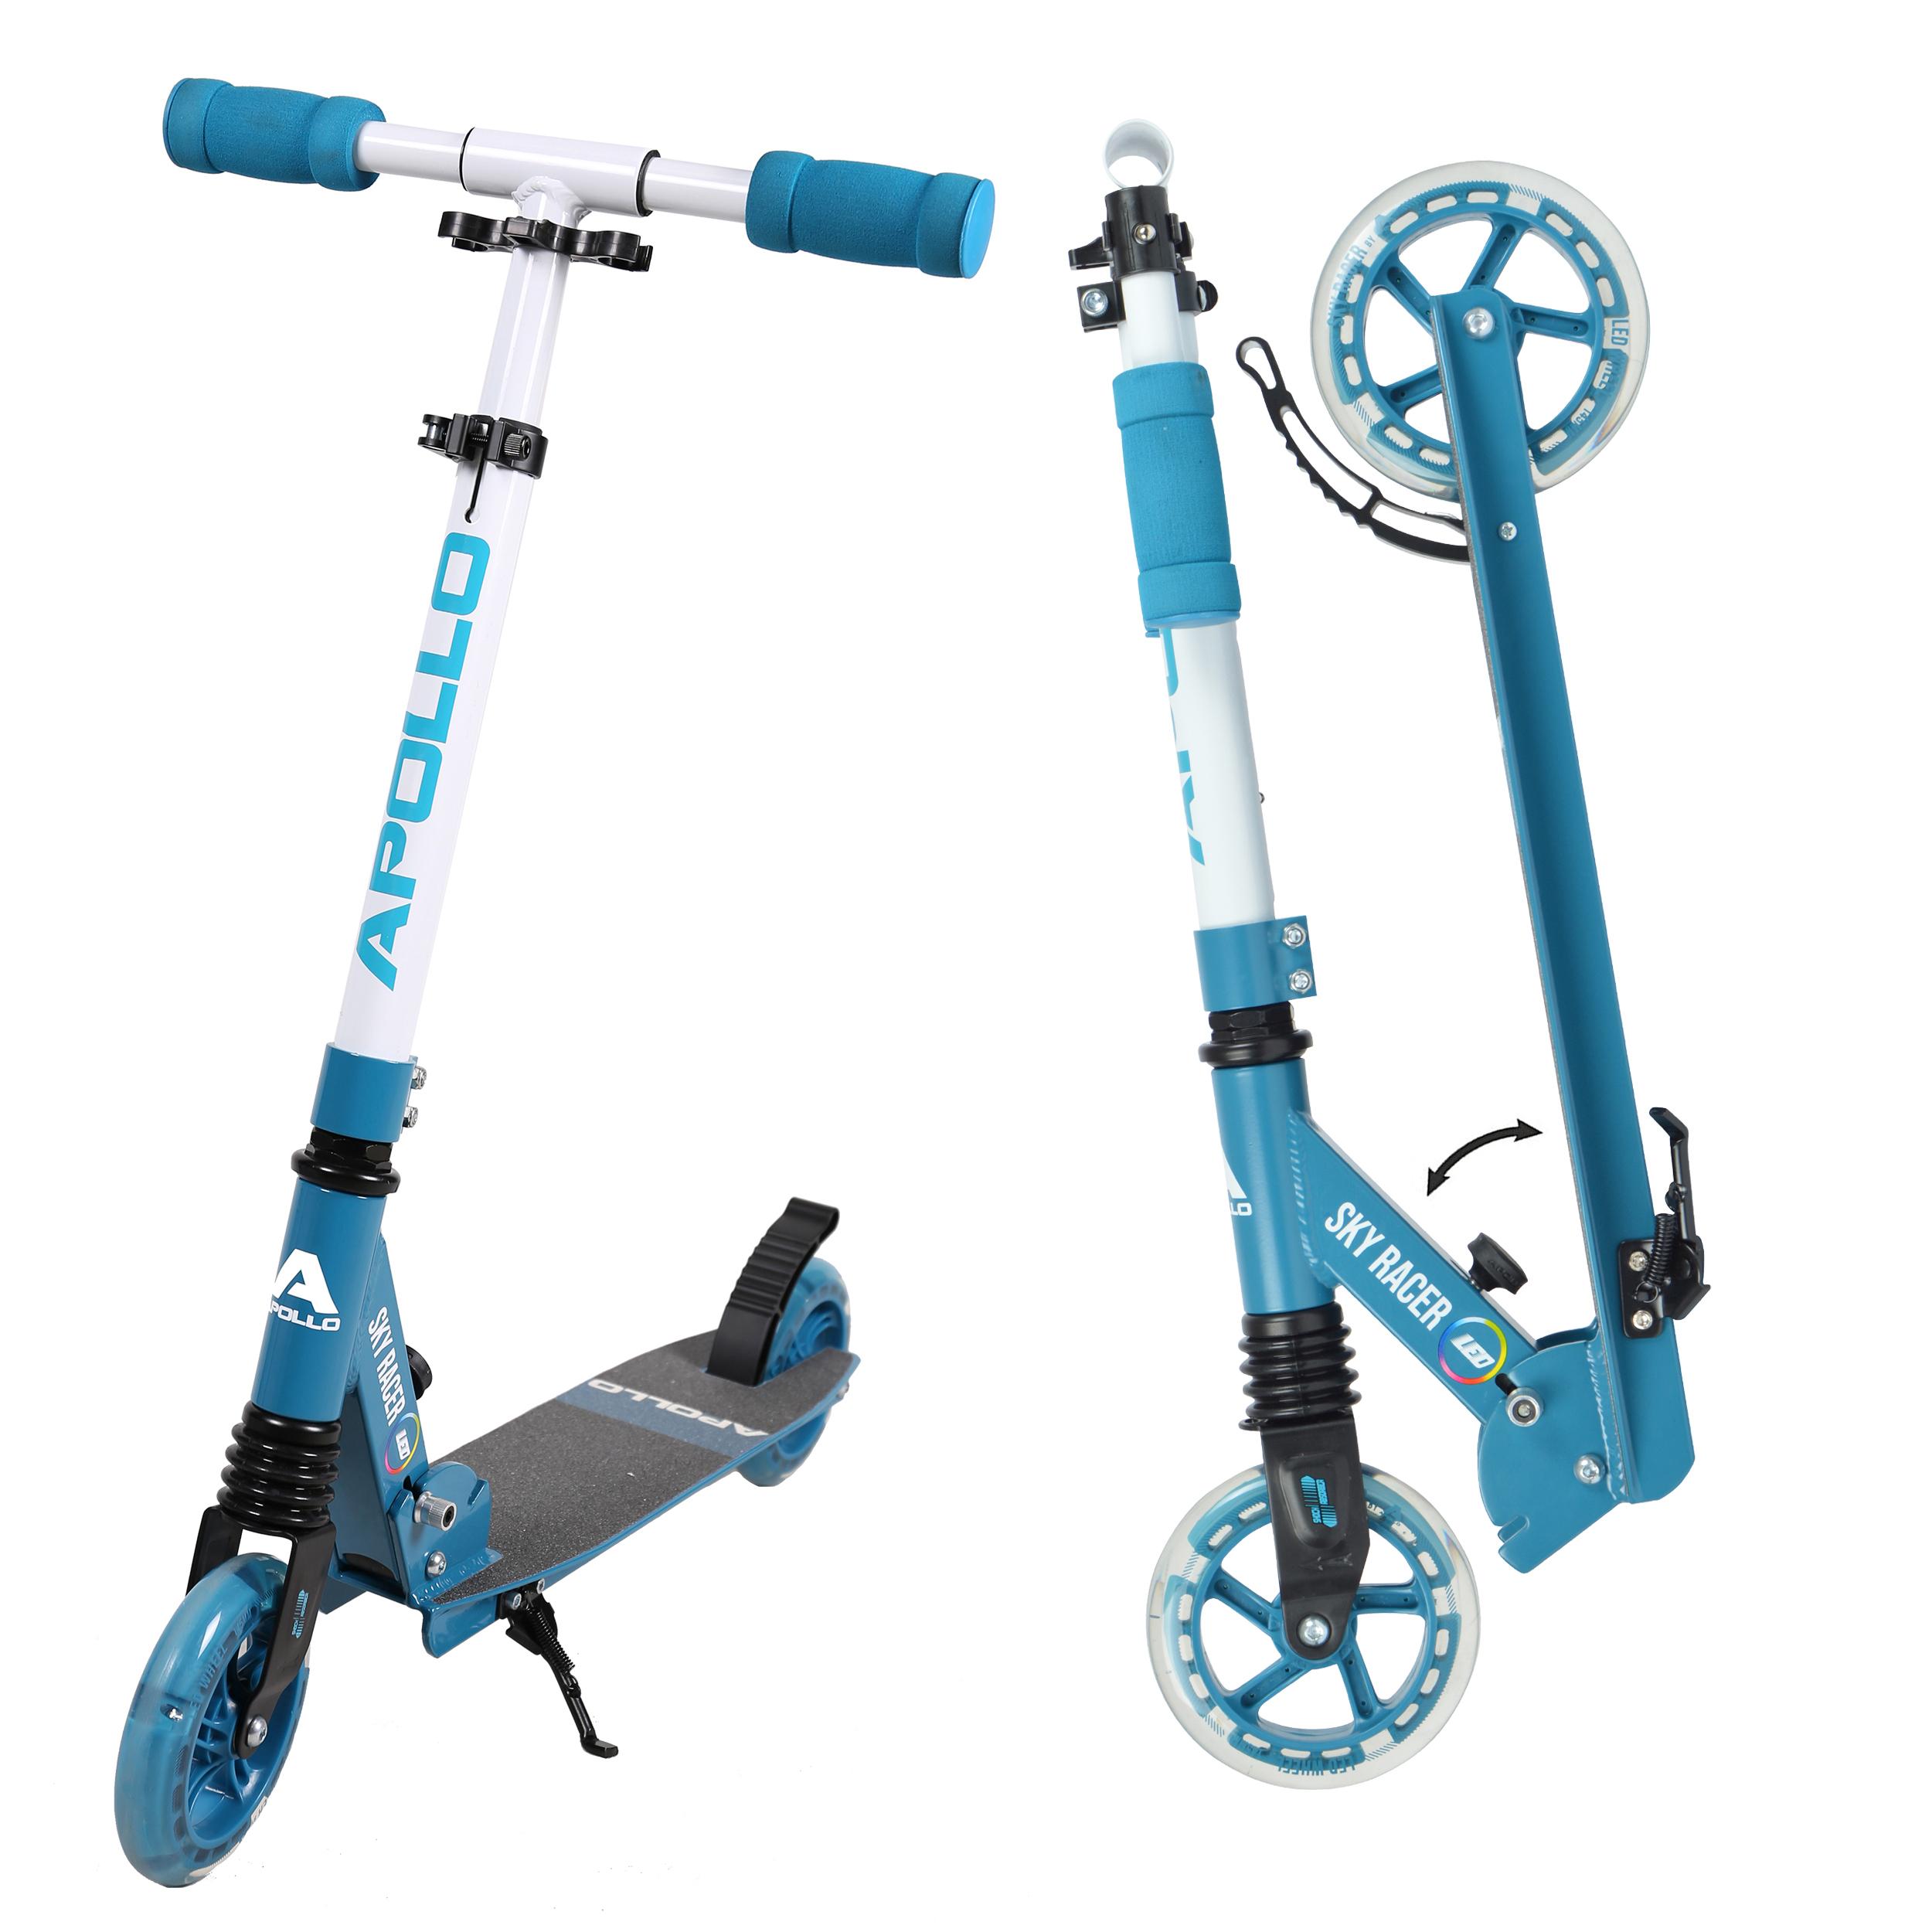 City Scooter - SkyRacer - Blue